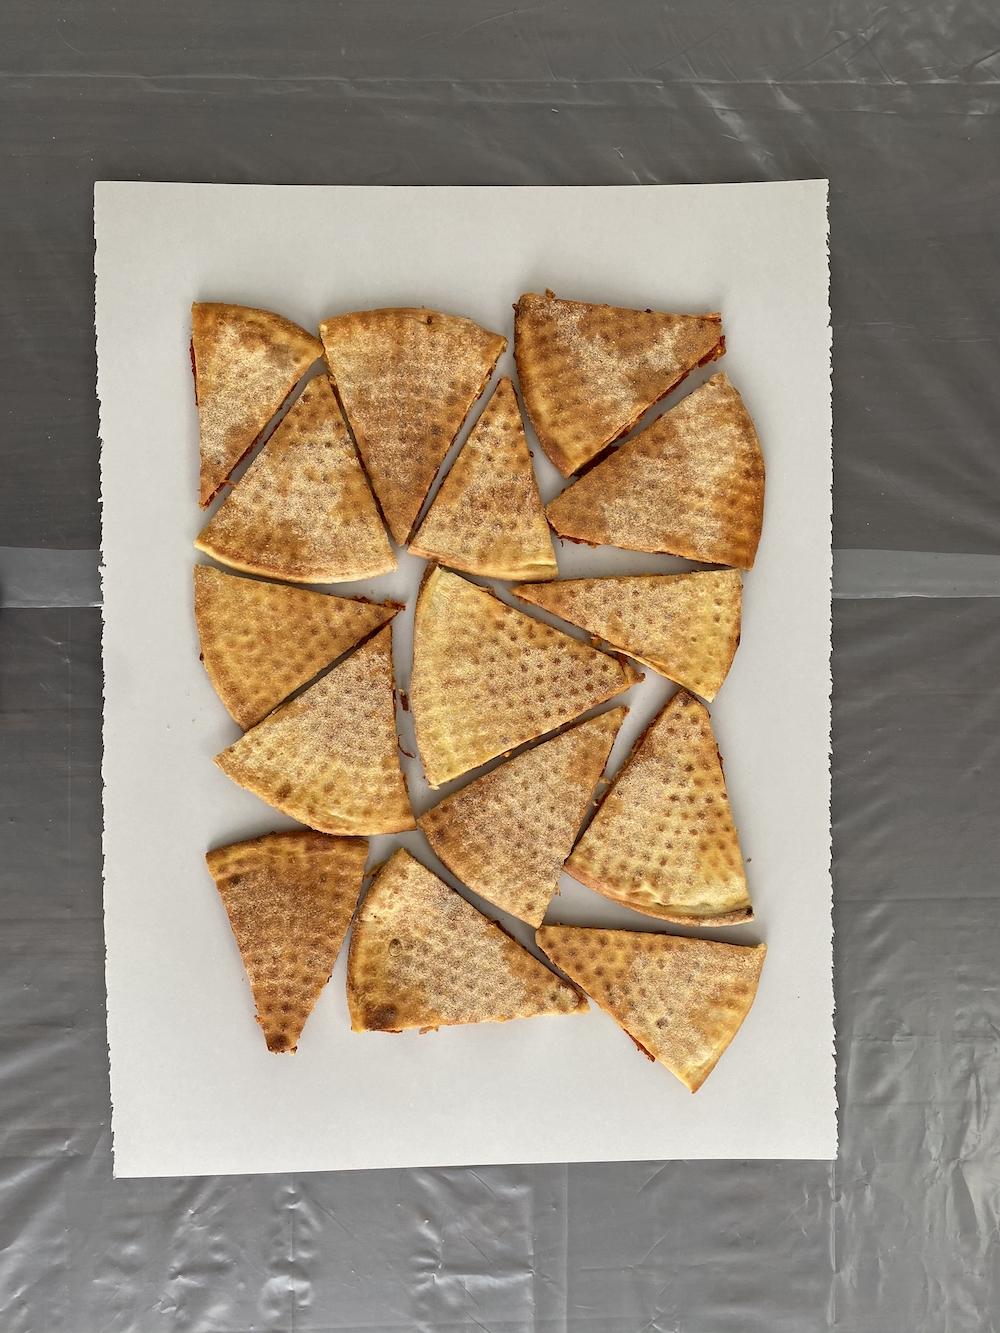 Carmen Argote uses pizza for printmaking